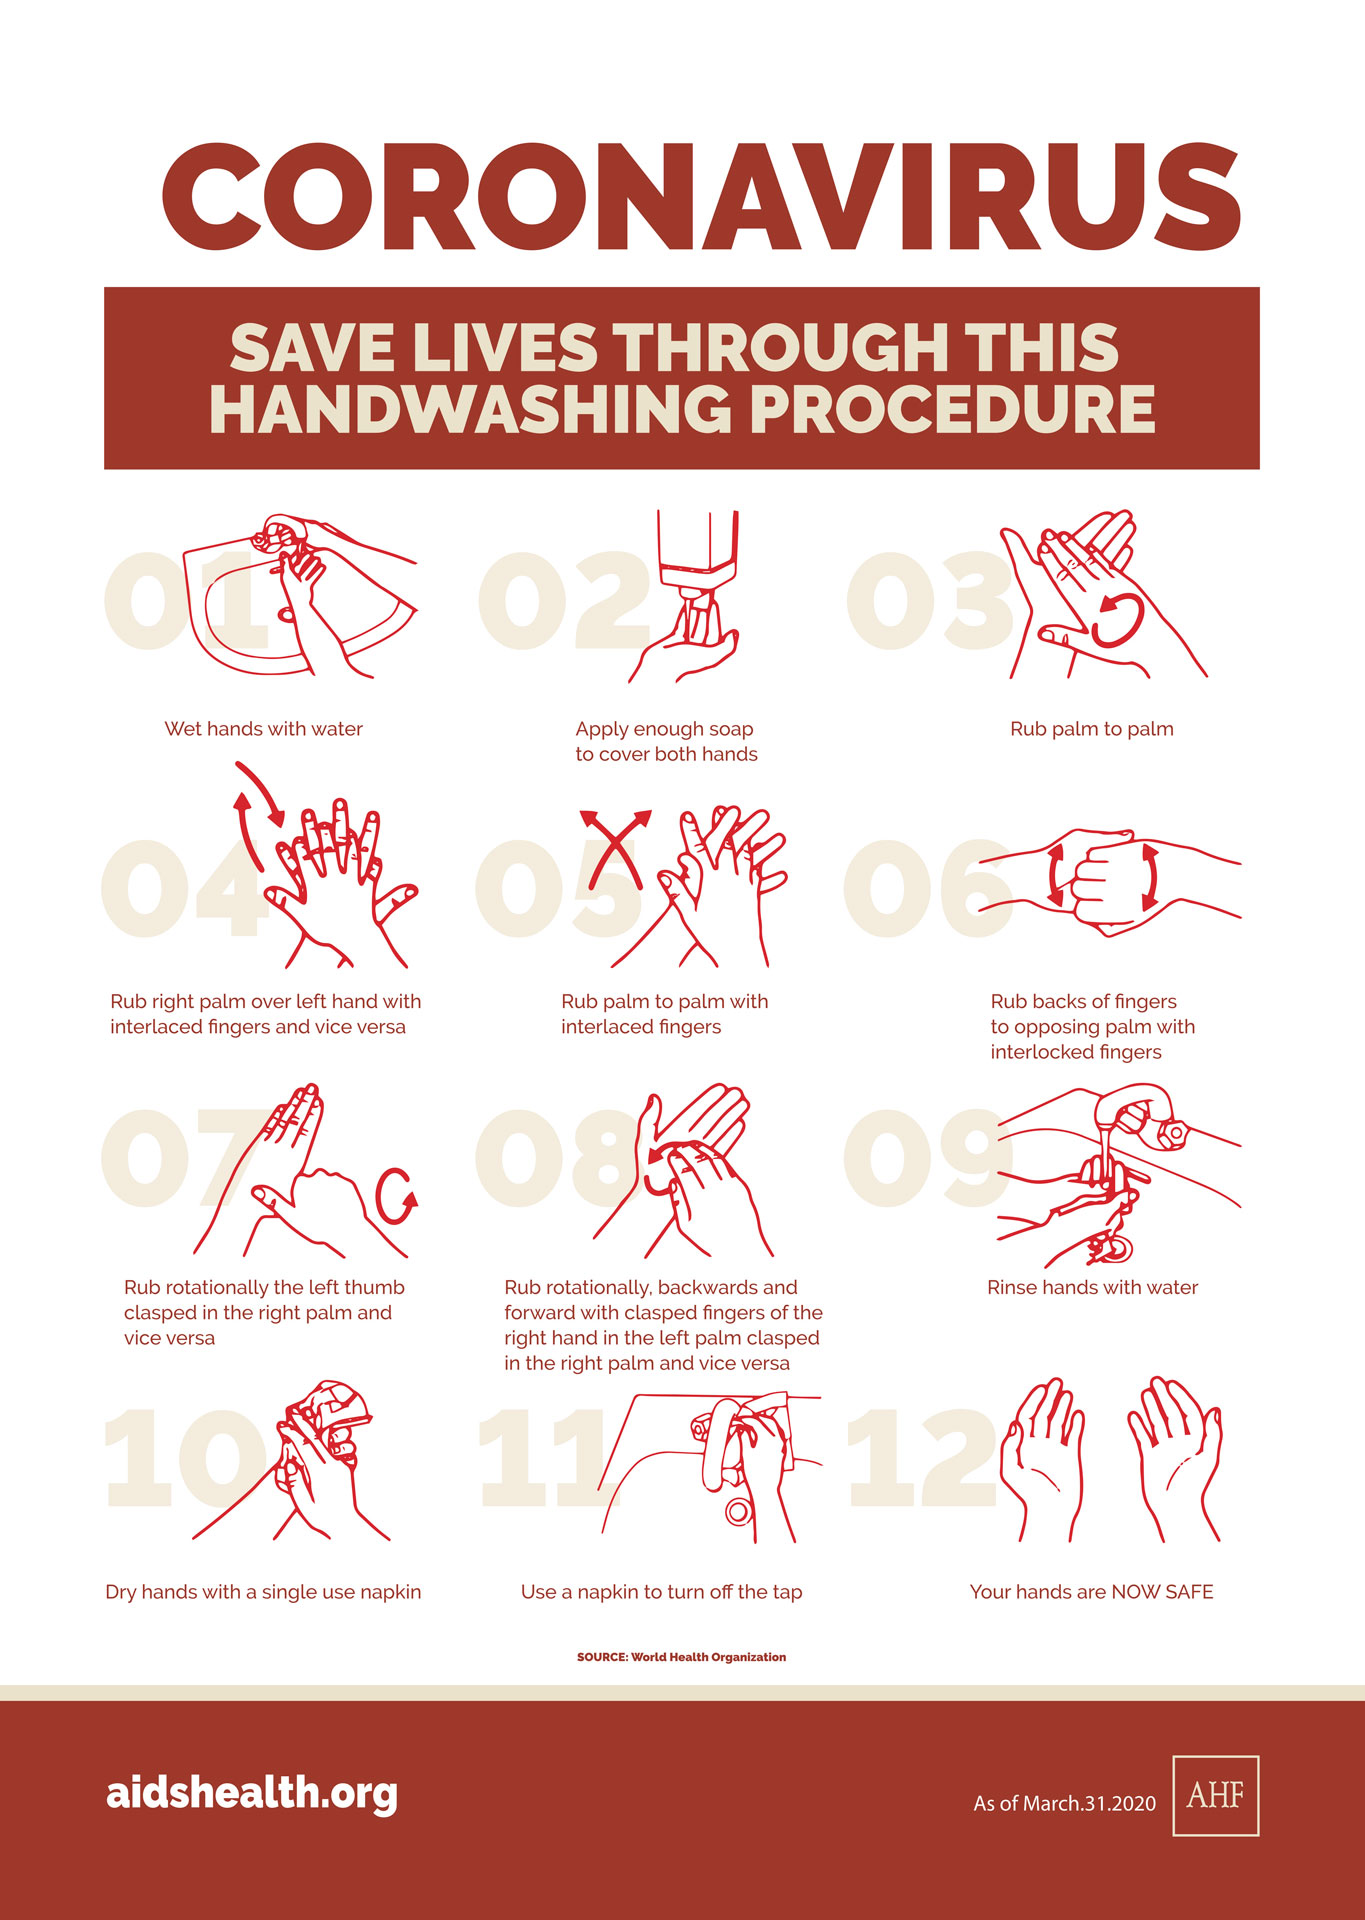 20 Iec Covid19 Advisory Hcw Handwashing Updated March.31.2020